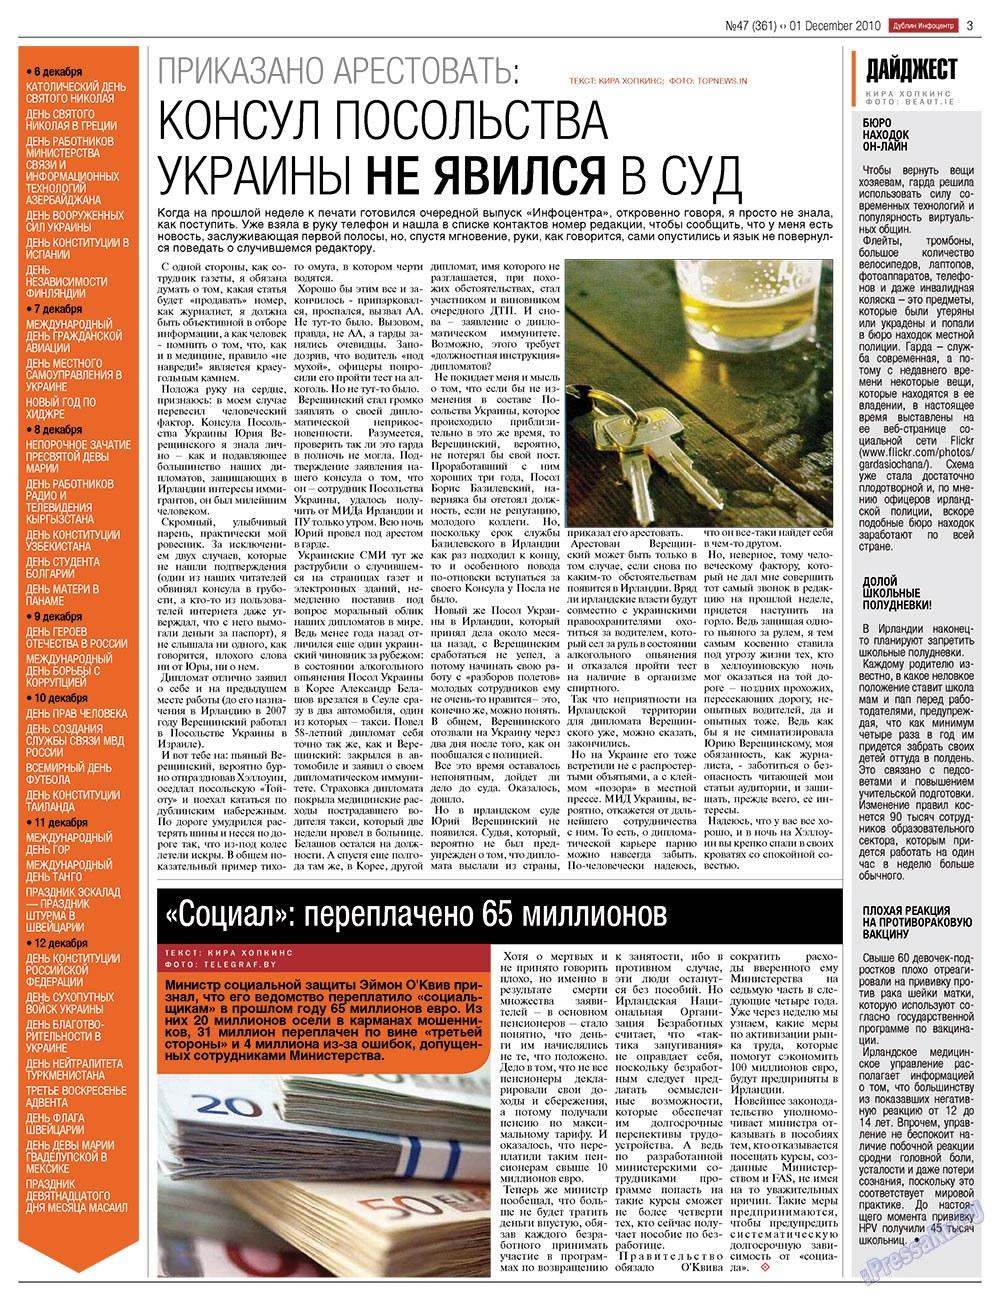 Дублин инфоцентр (газета). 2010 год, номер 47, стр. 3